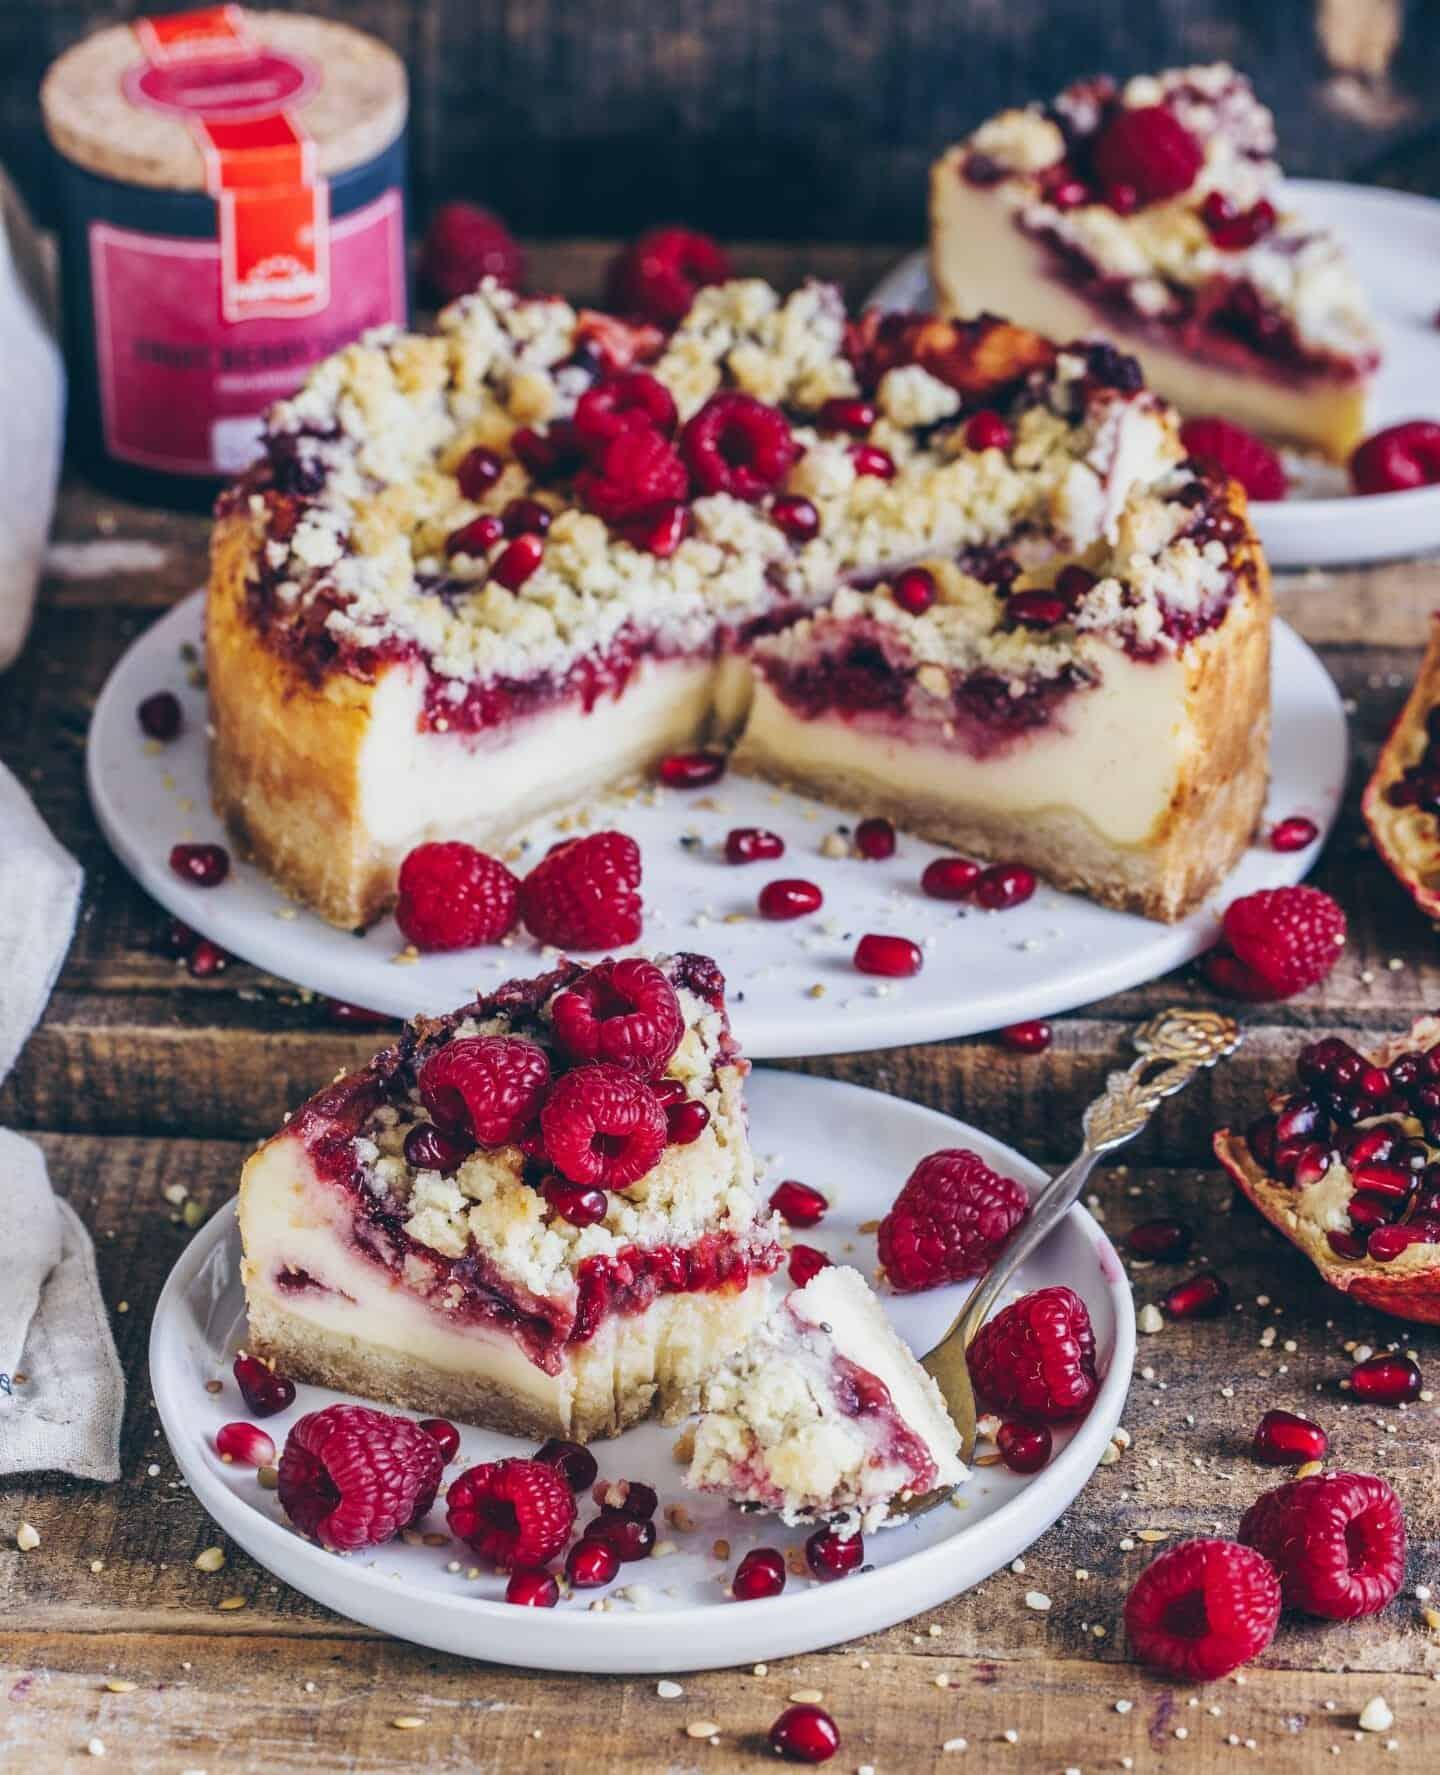 Kase Streuselkuchen Mit Saftiger Beerenfullung Vegan Bianca Zapatka